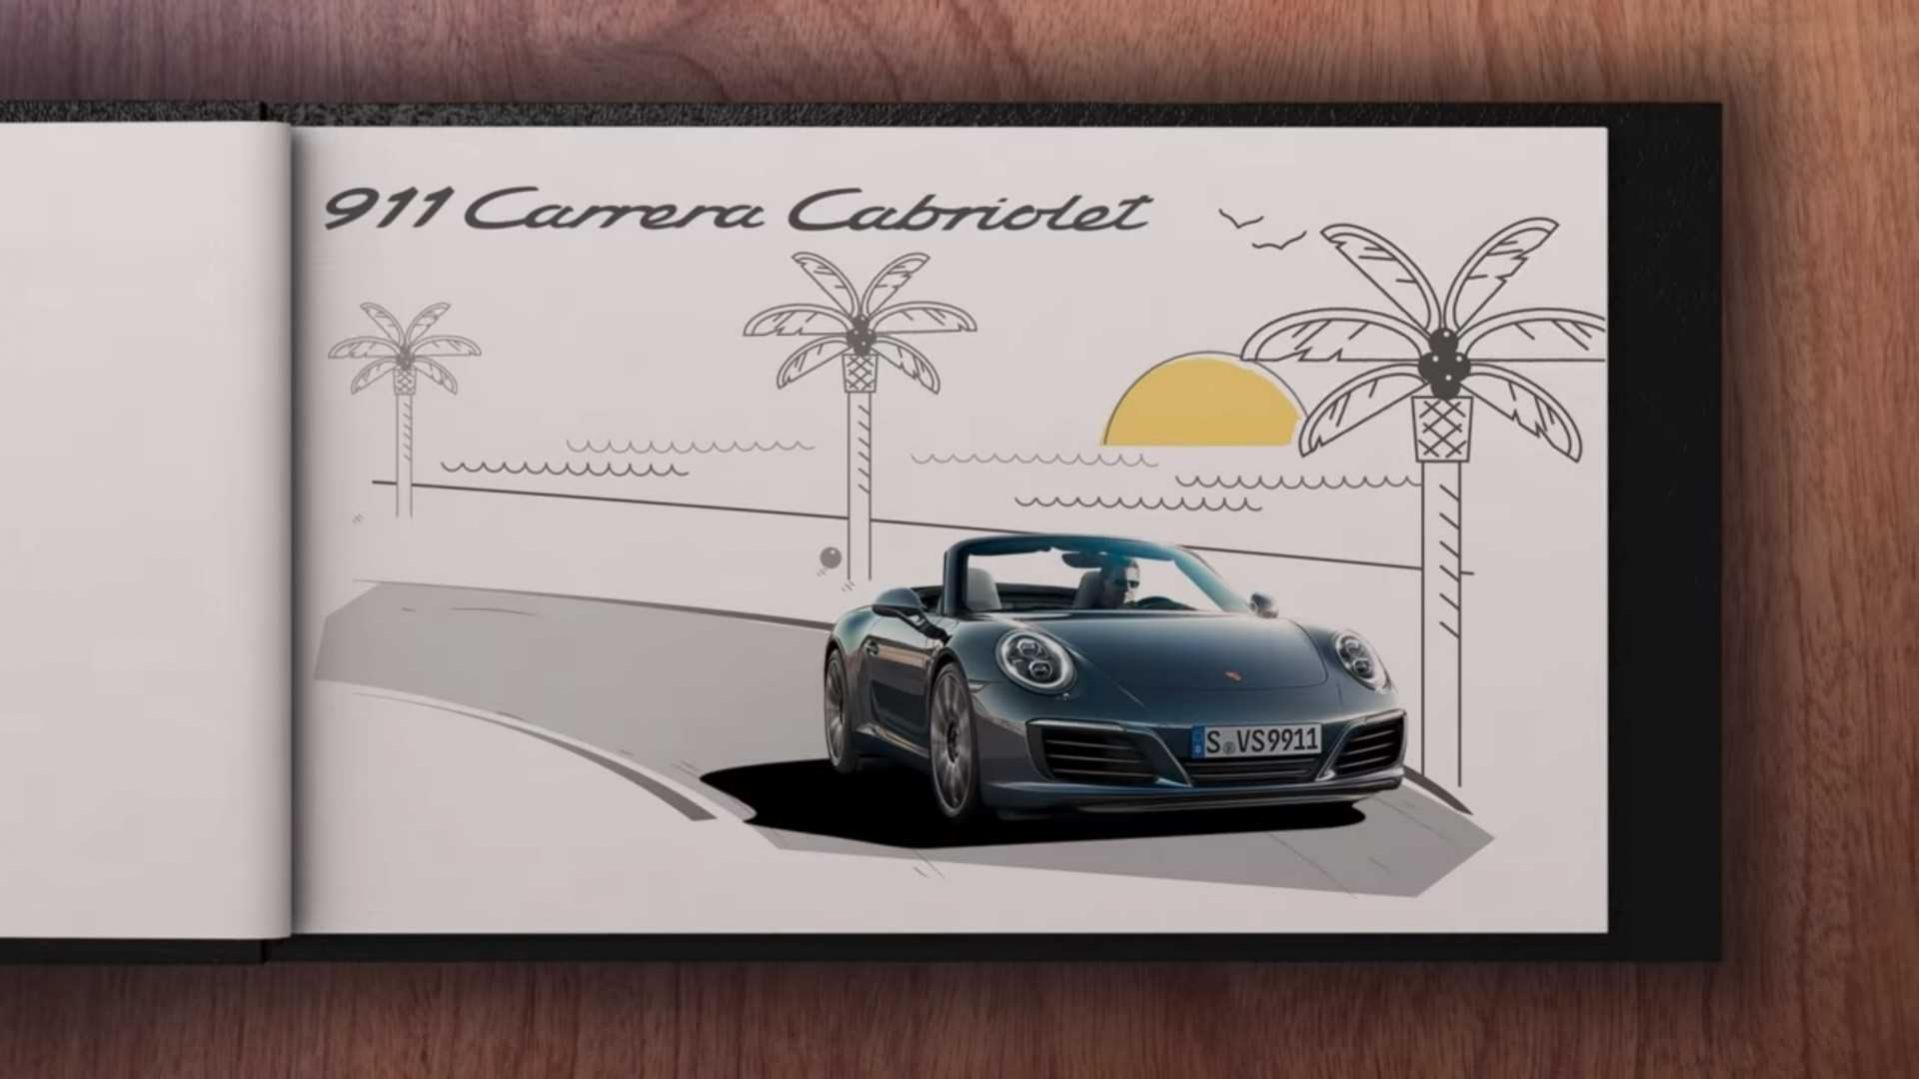 Porsche 911 Carrera Cabriolet For Sale